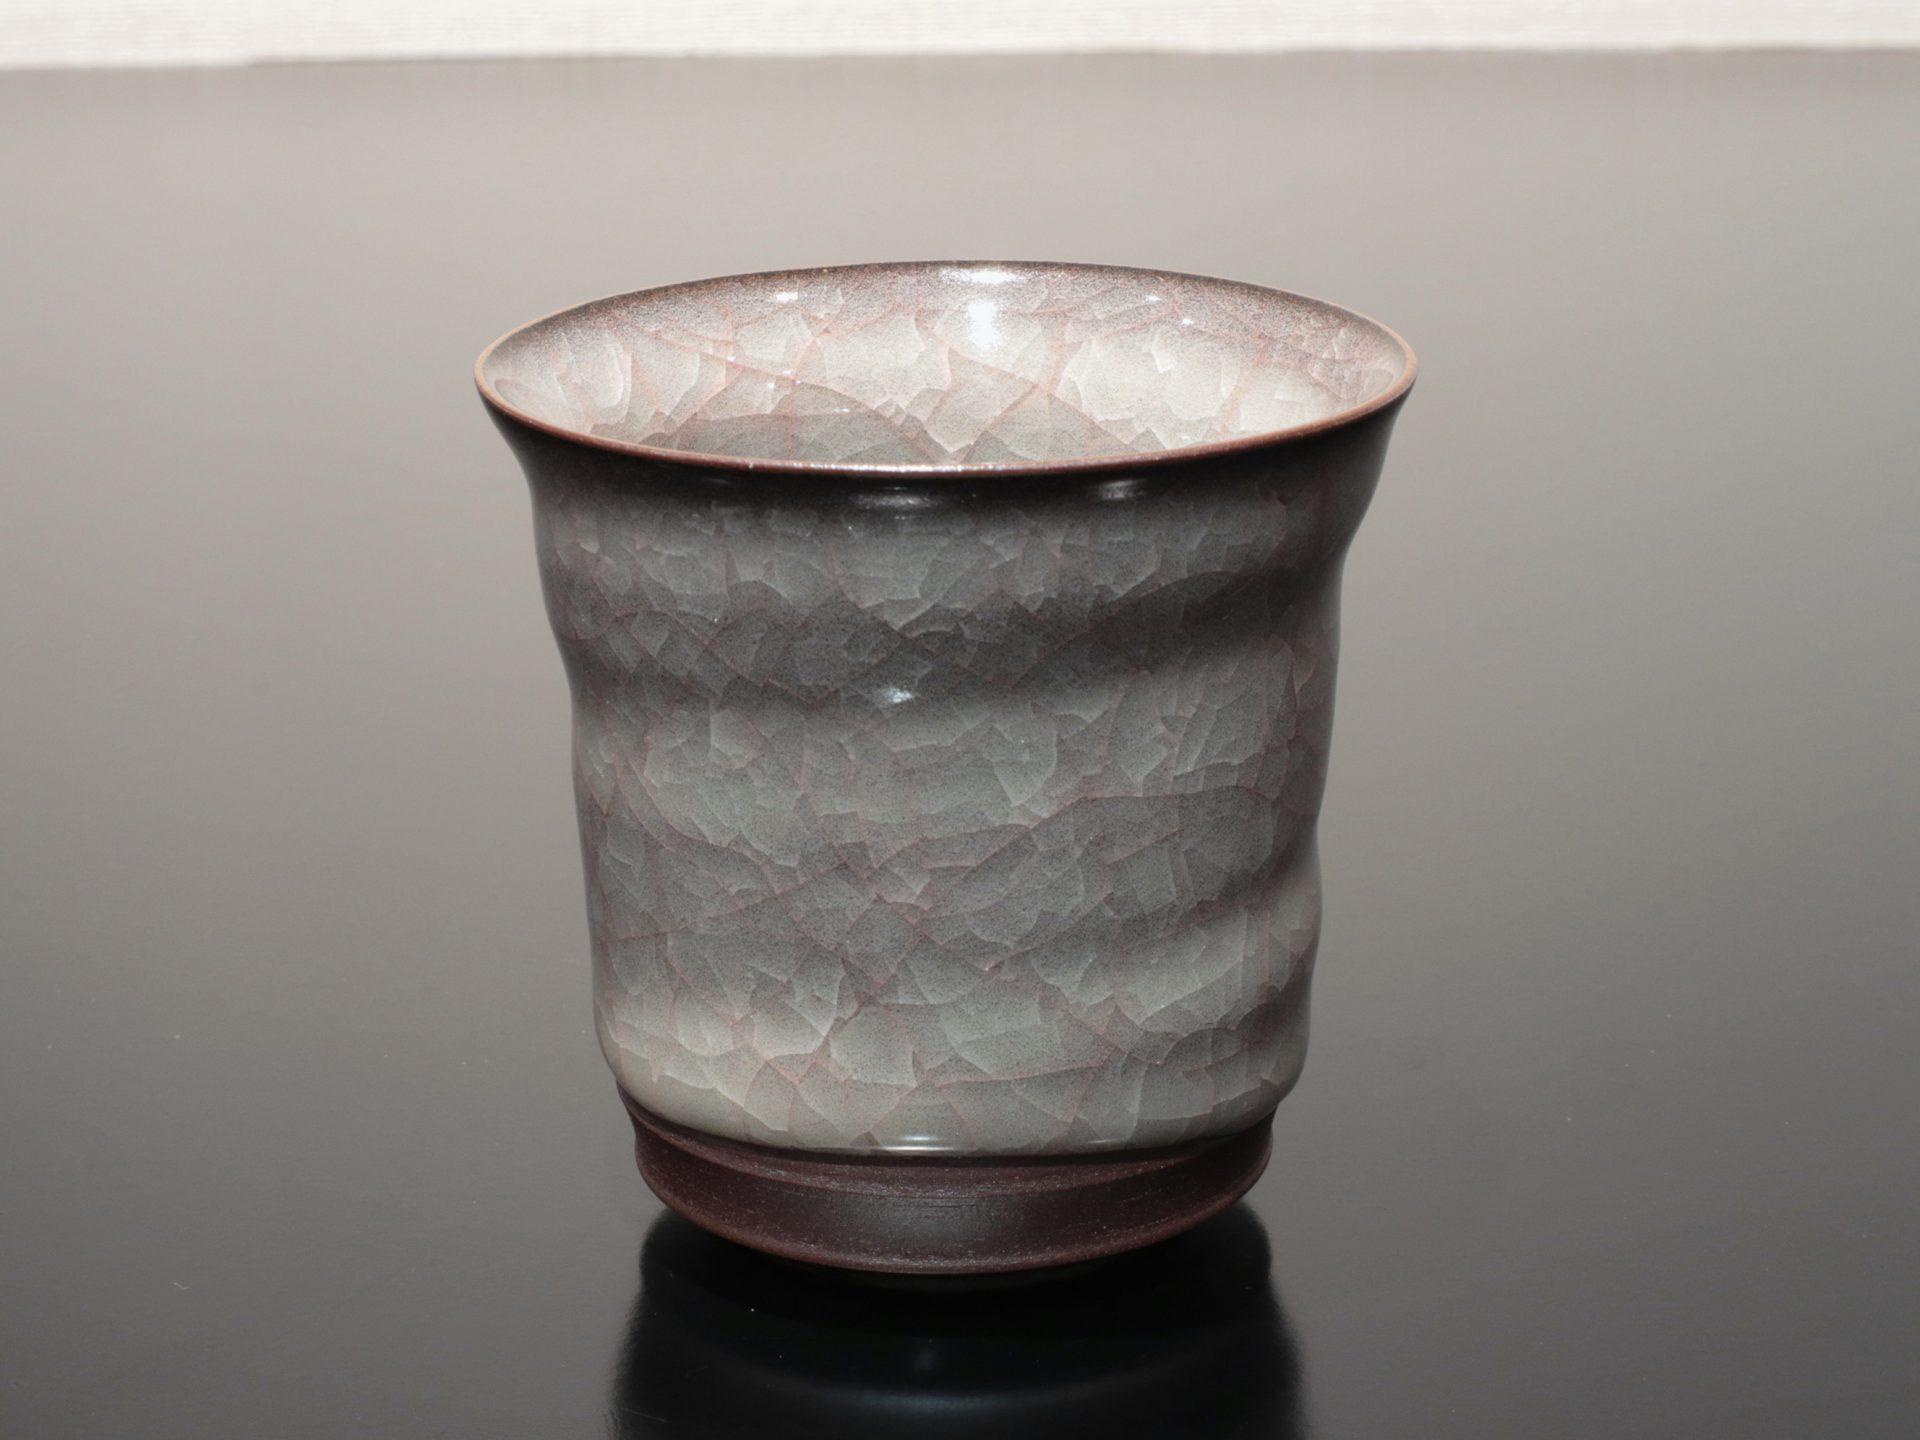 志賀暁吉 米色瓷湯呑 焼酎杯 カップ